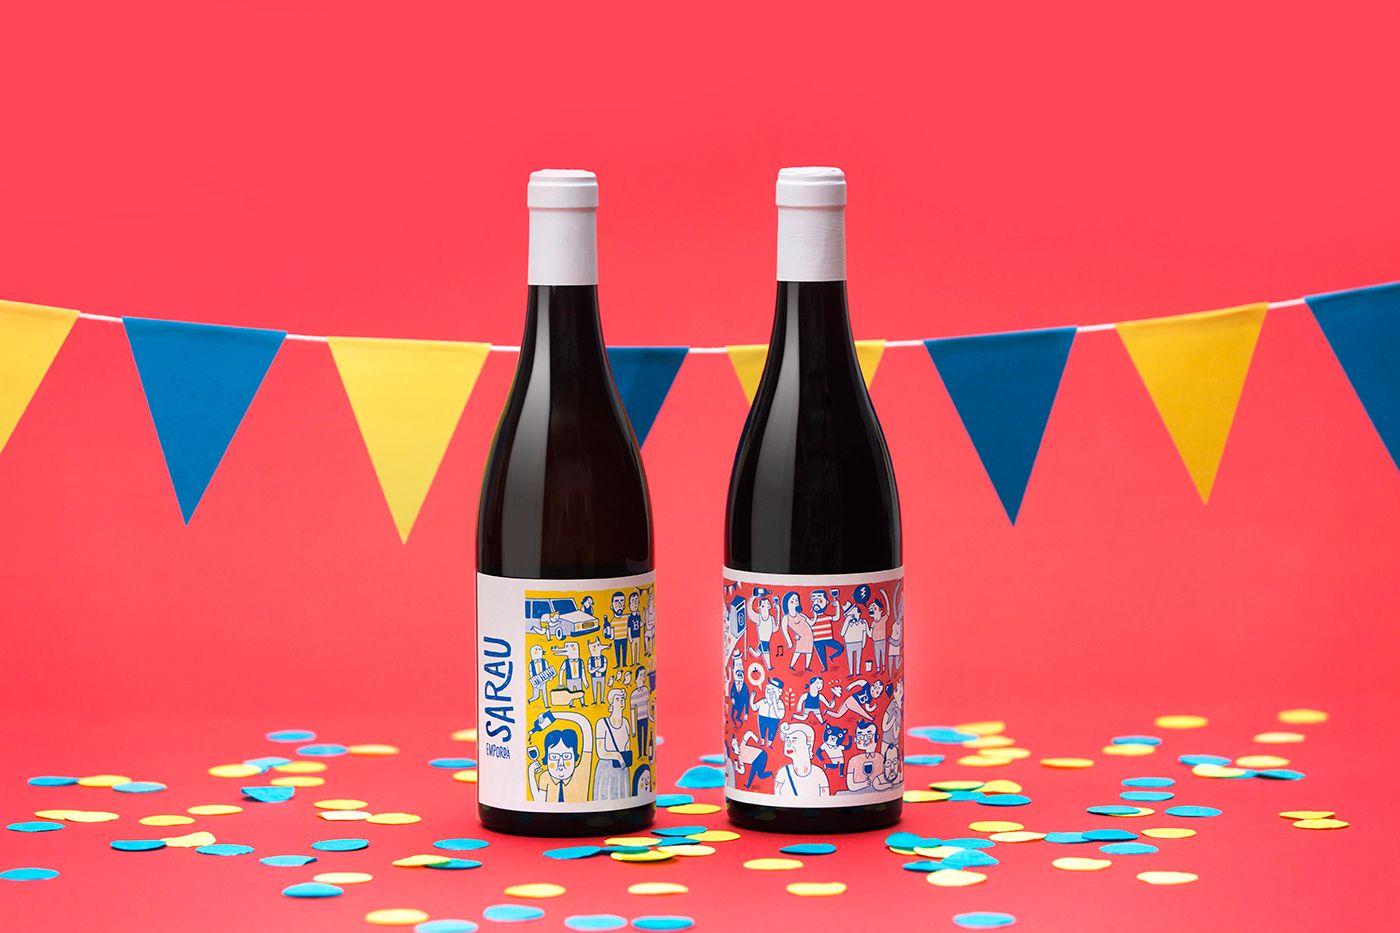 Sarau Wine On Packaging Of The World Creative Package Design Gallery Wine Packaging Design Wine Design Wine